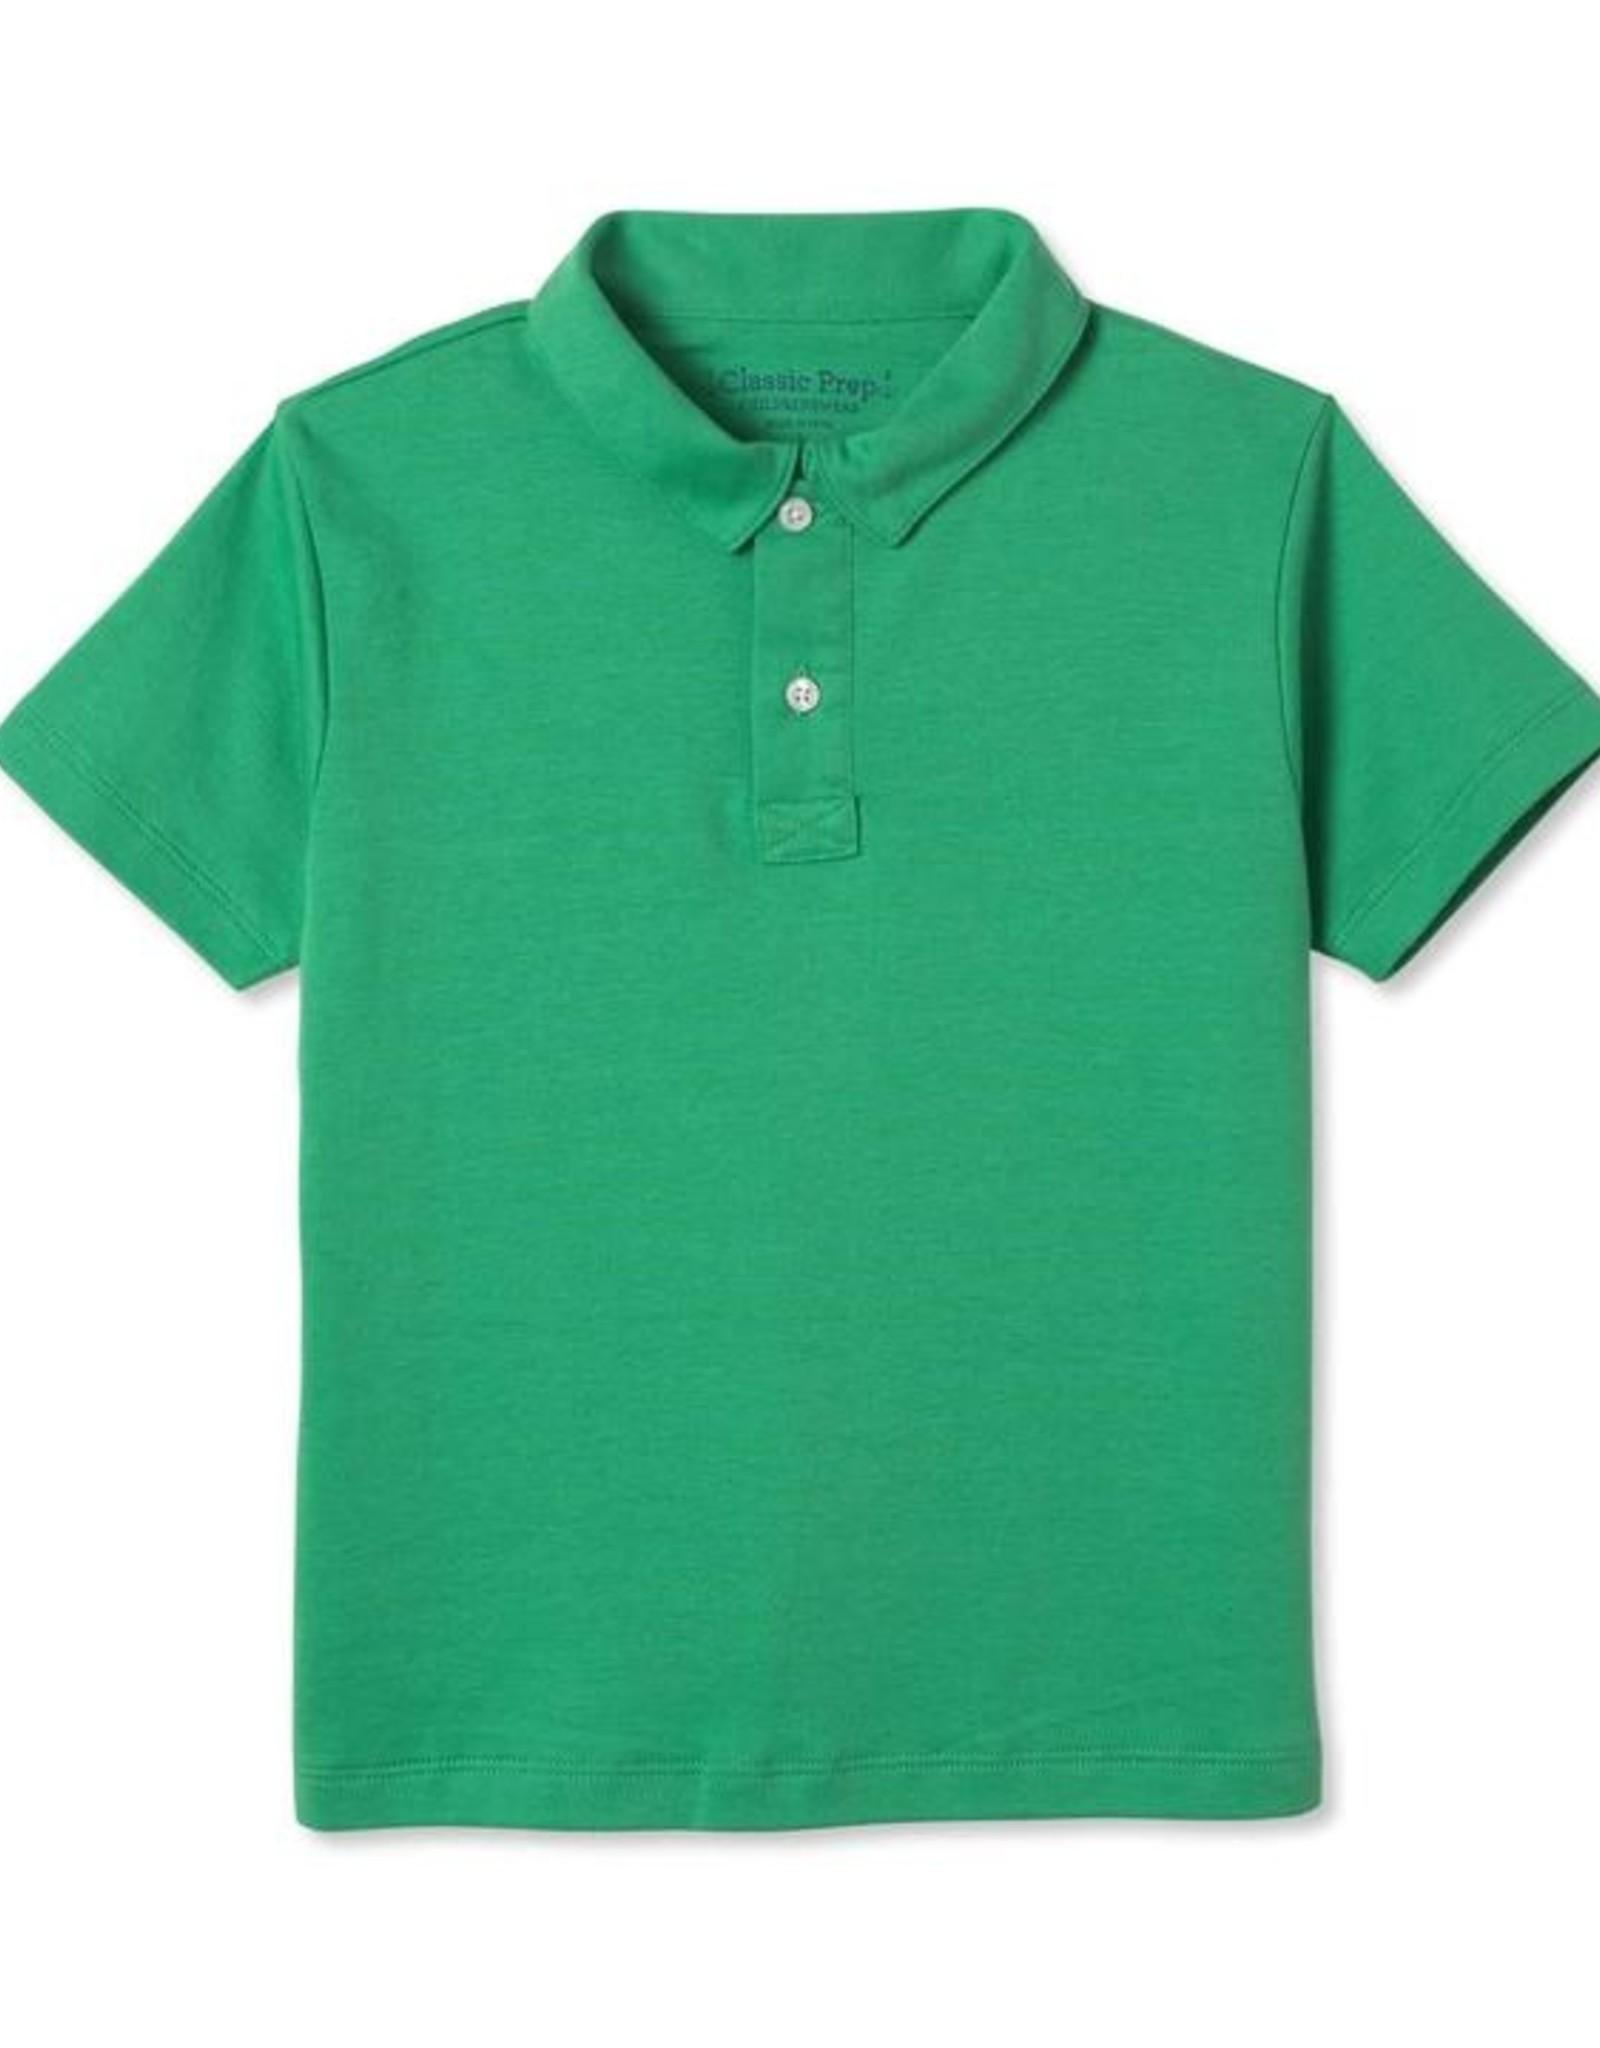 Classic prep Henry Short Sleeve Polo